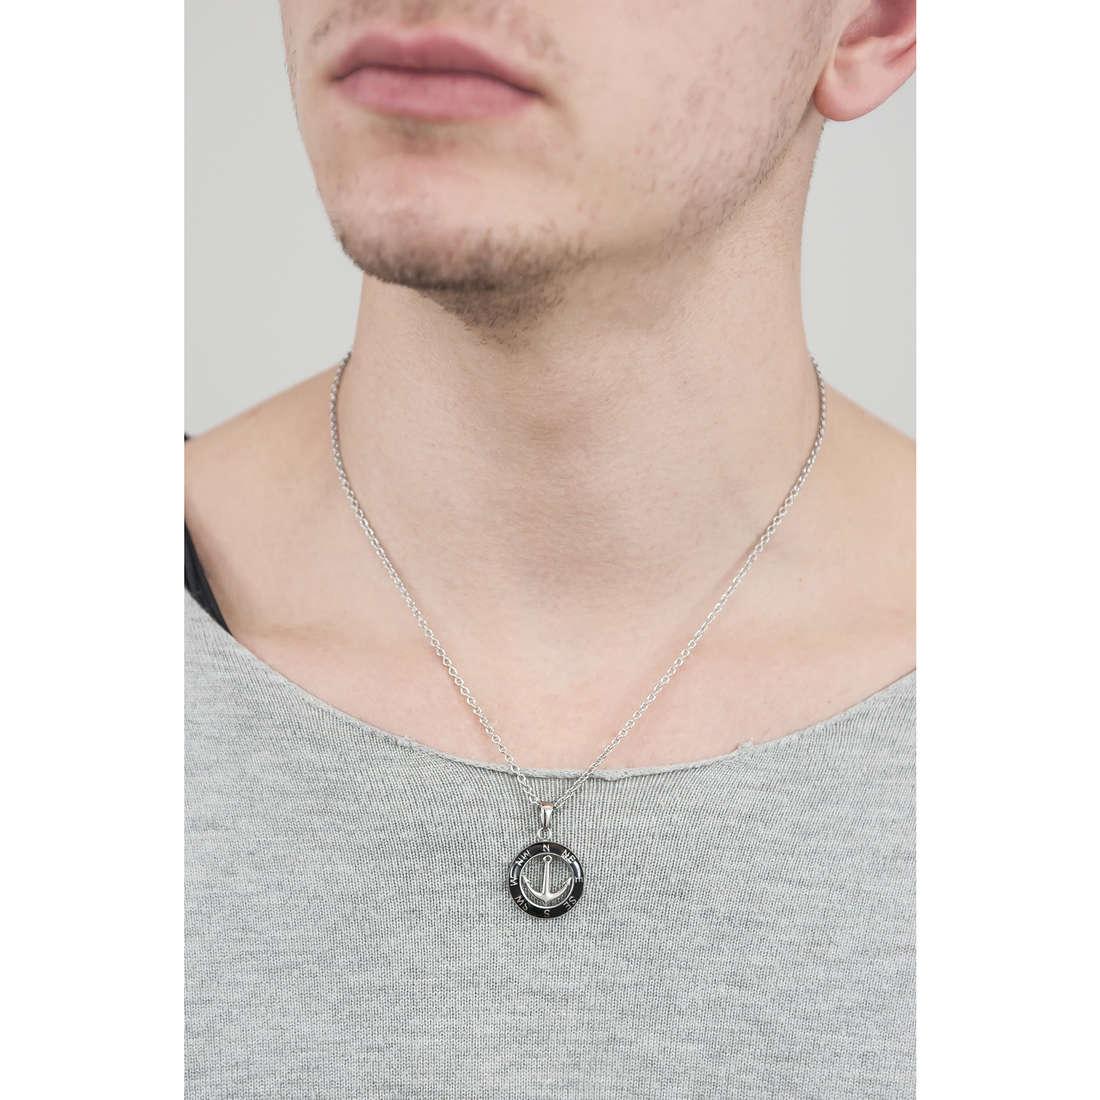 Sector necklaces Marine man SADQ03 indosso